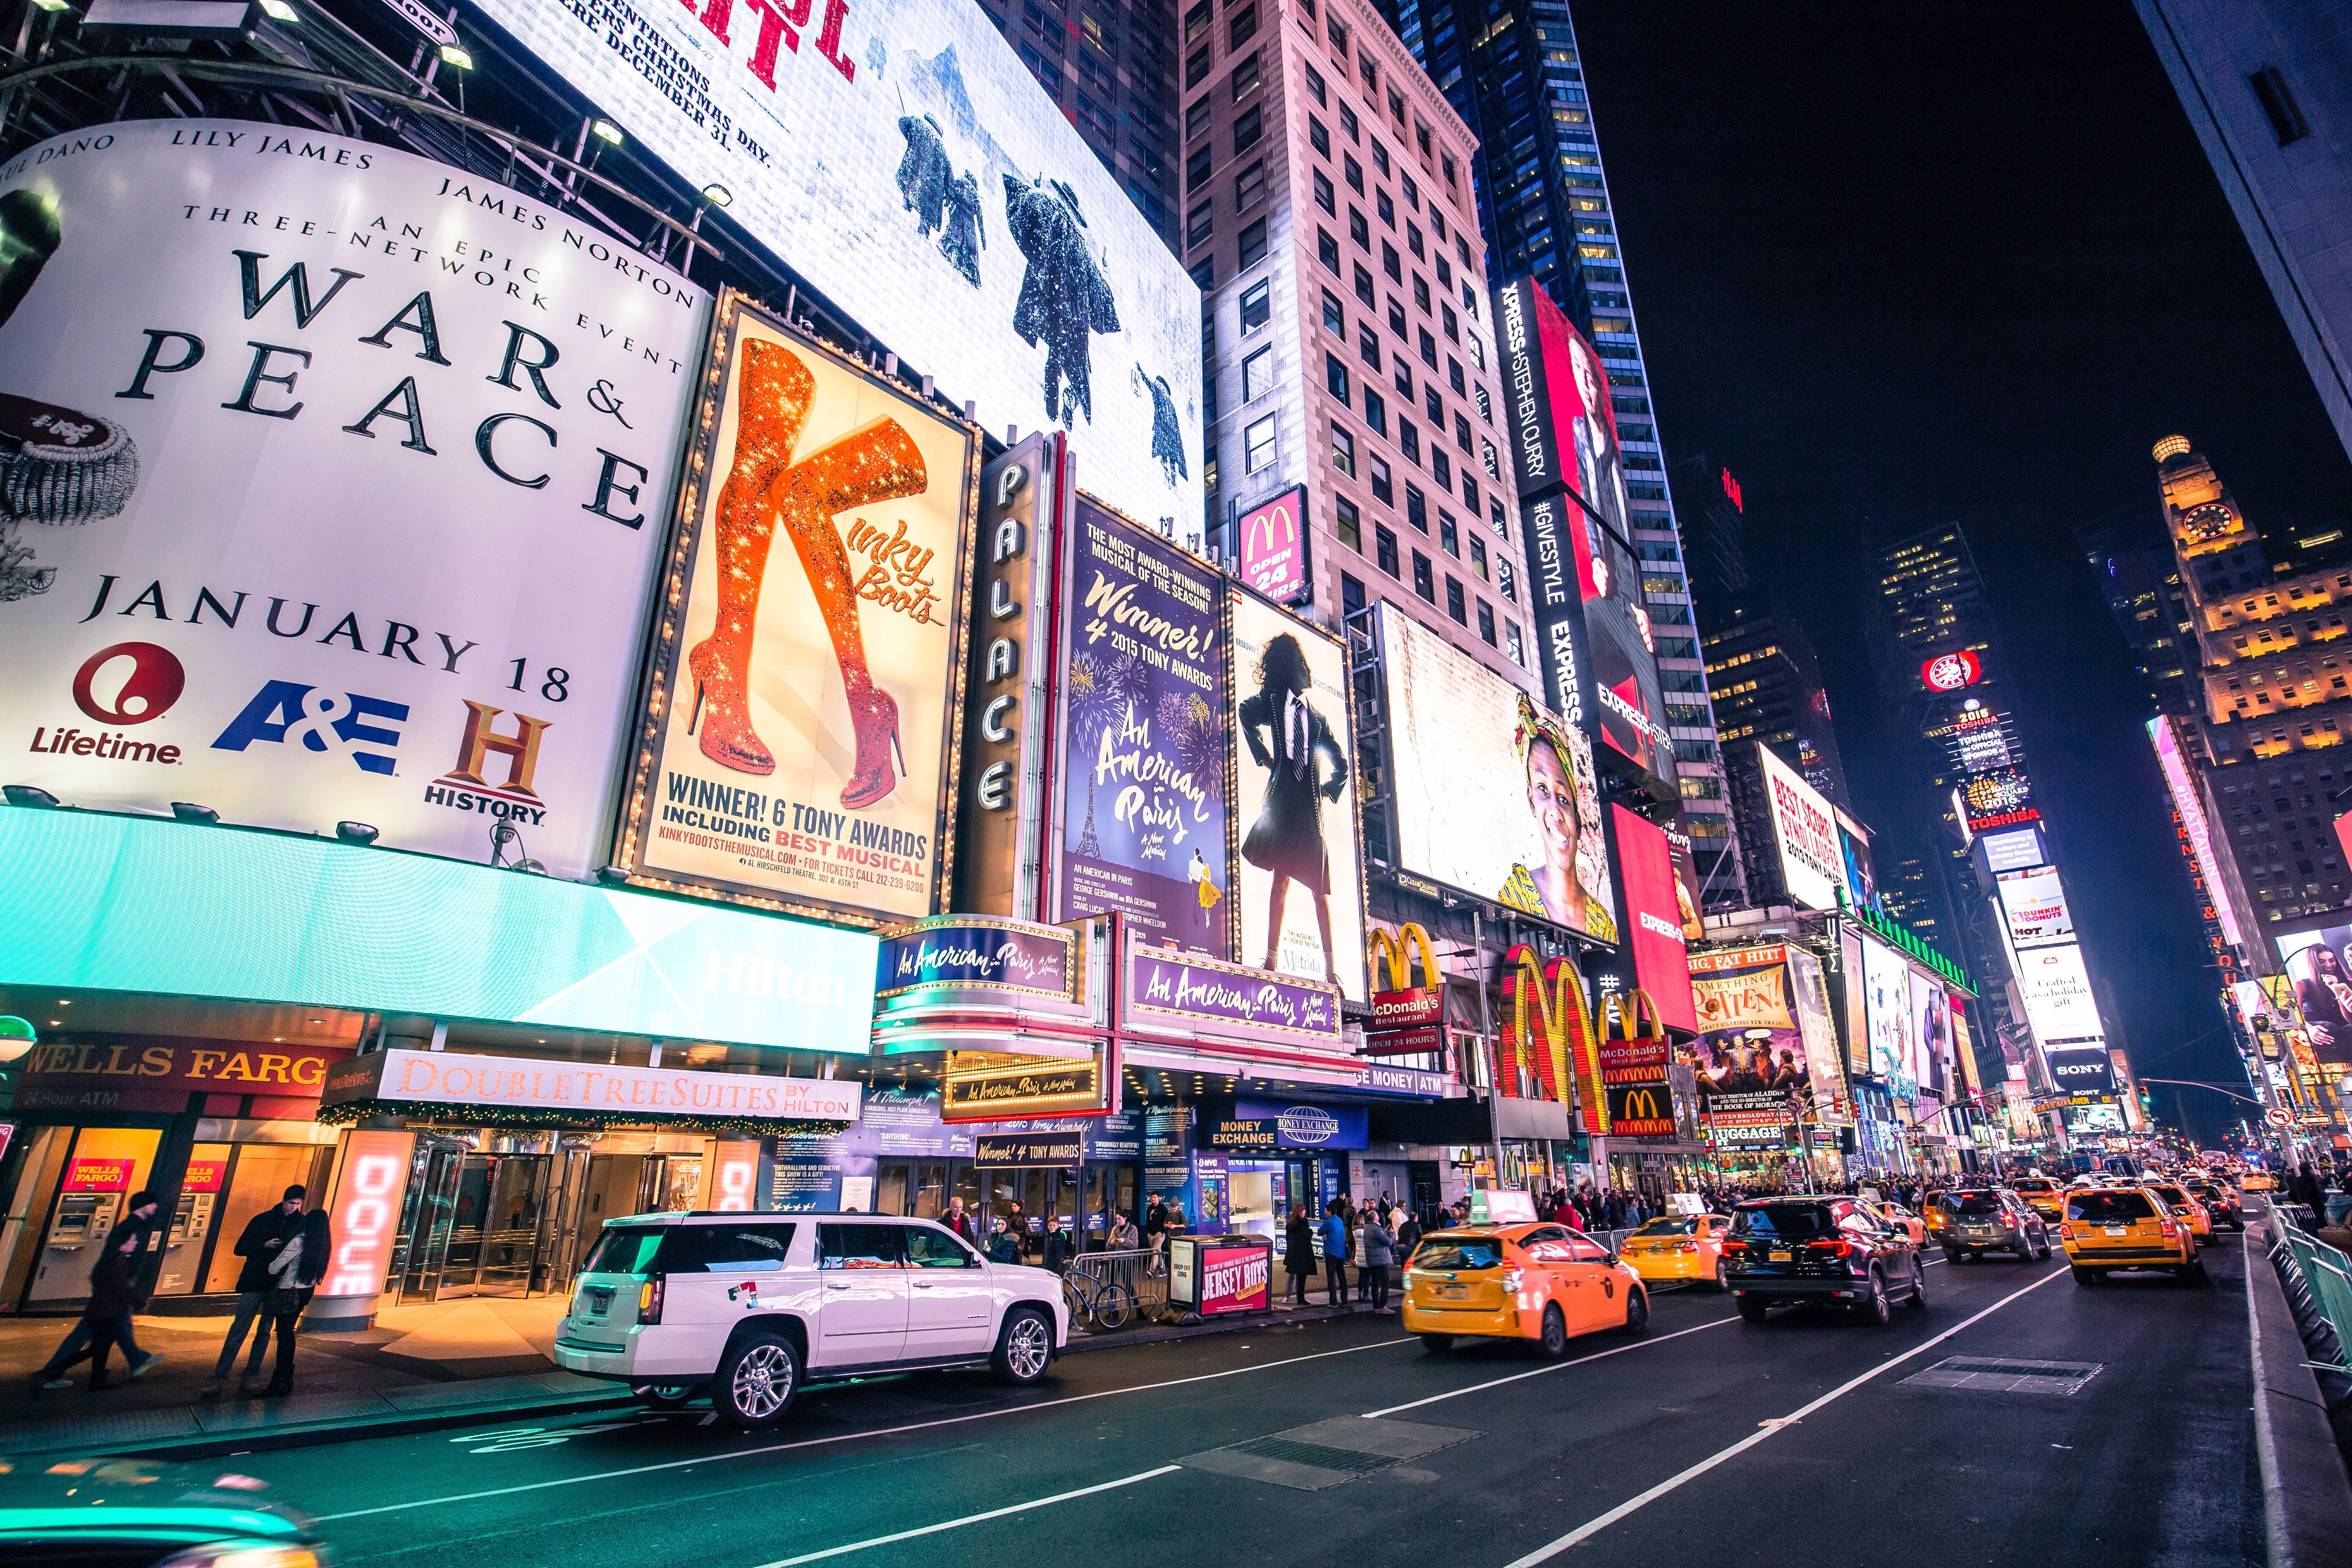 Binnenkort Naar New York? Zo Krijg Je Goedkope Broadway Tickets!